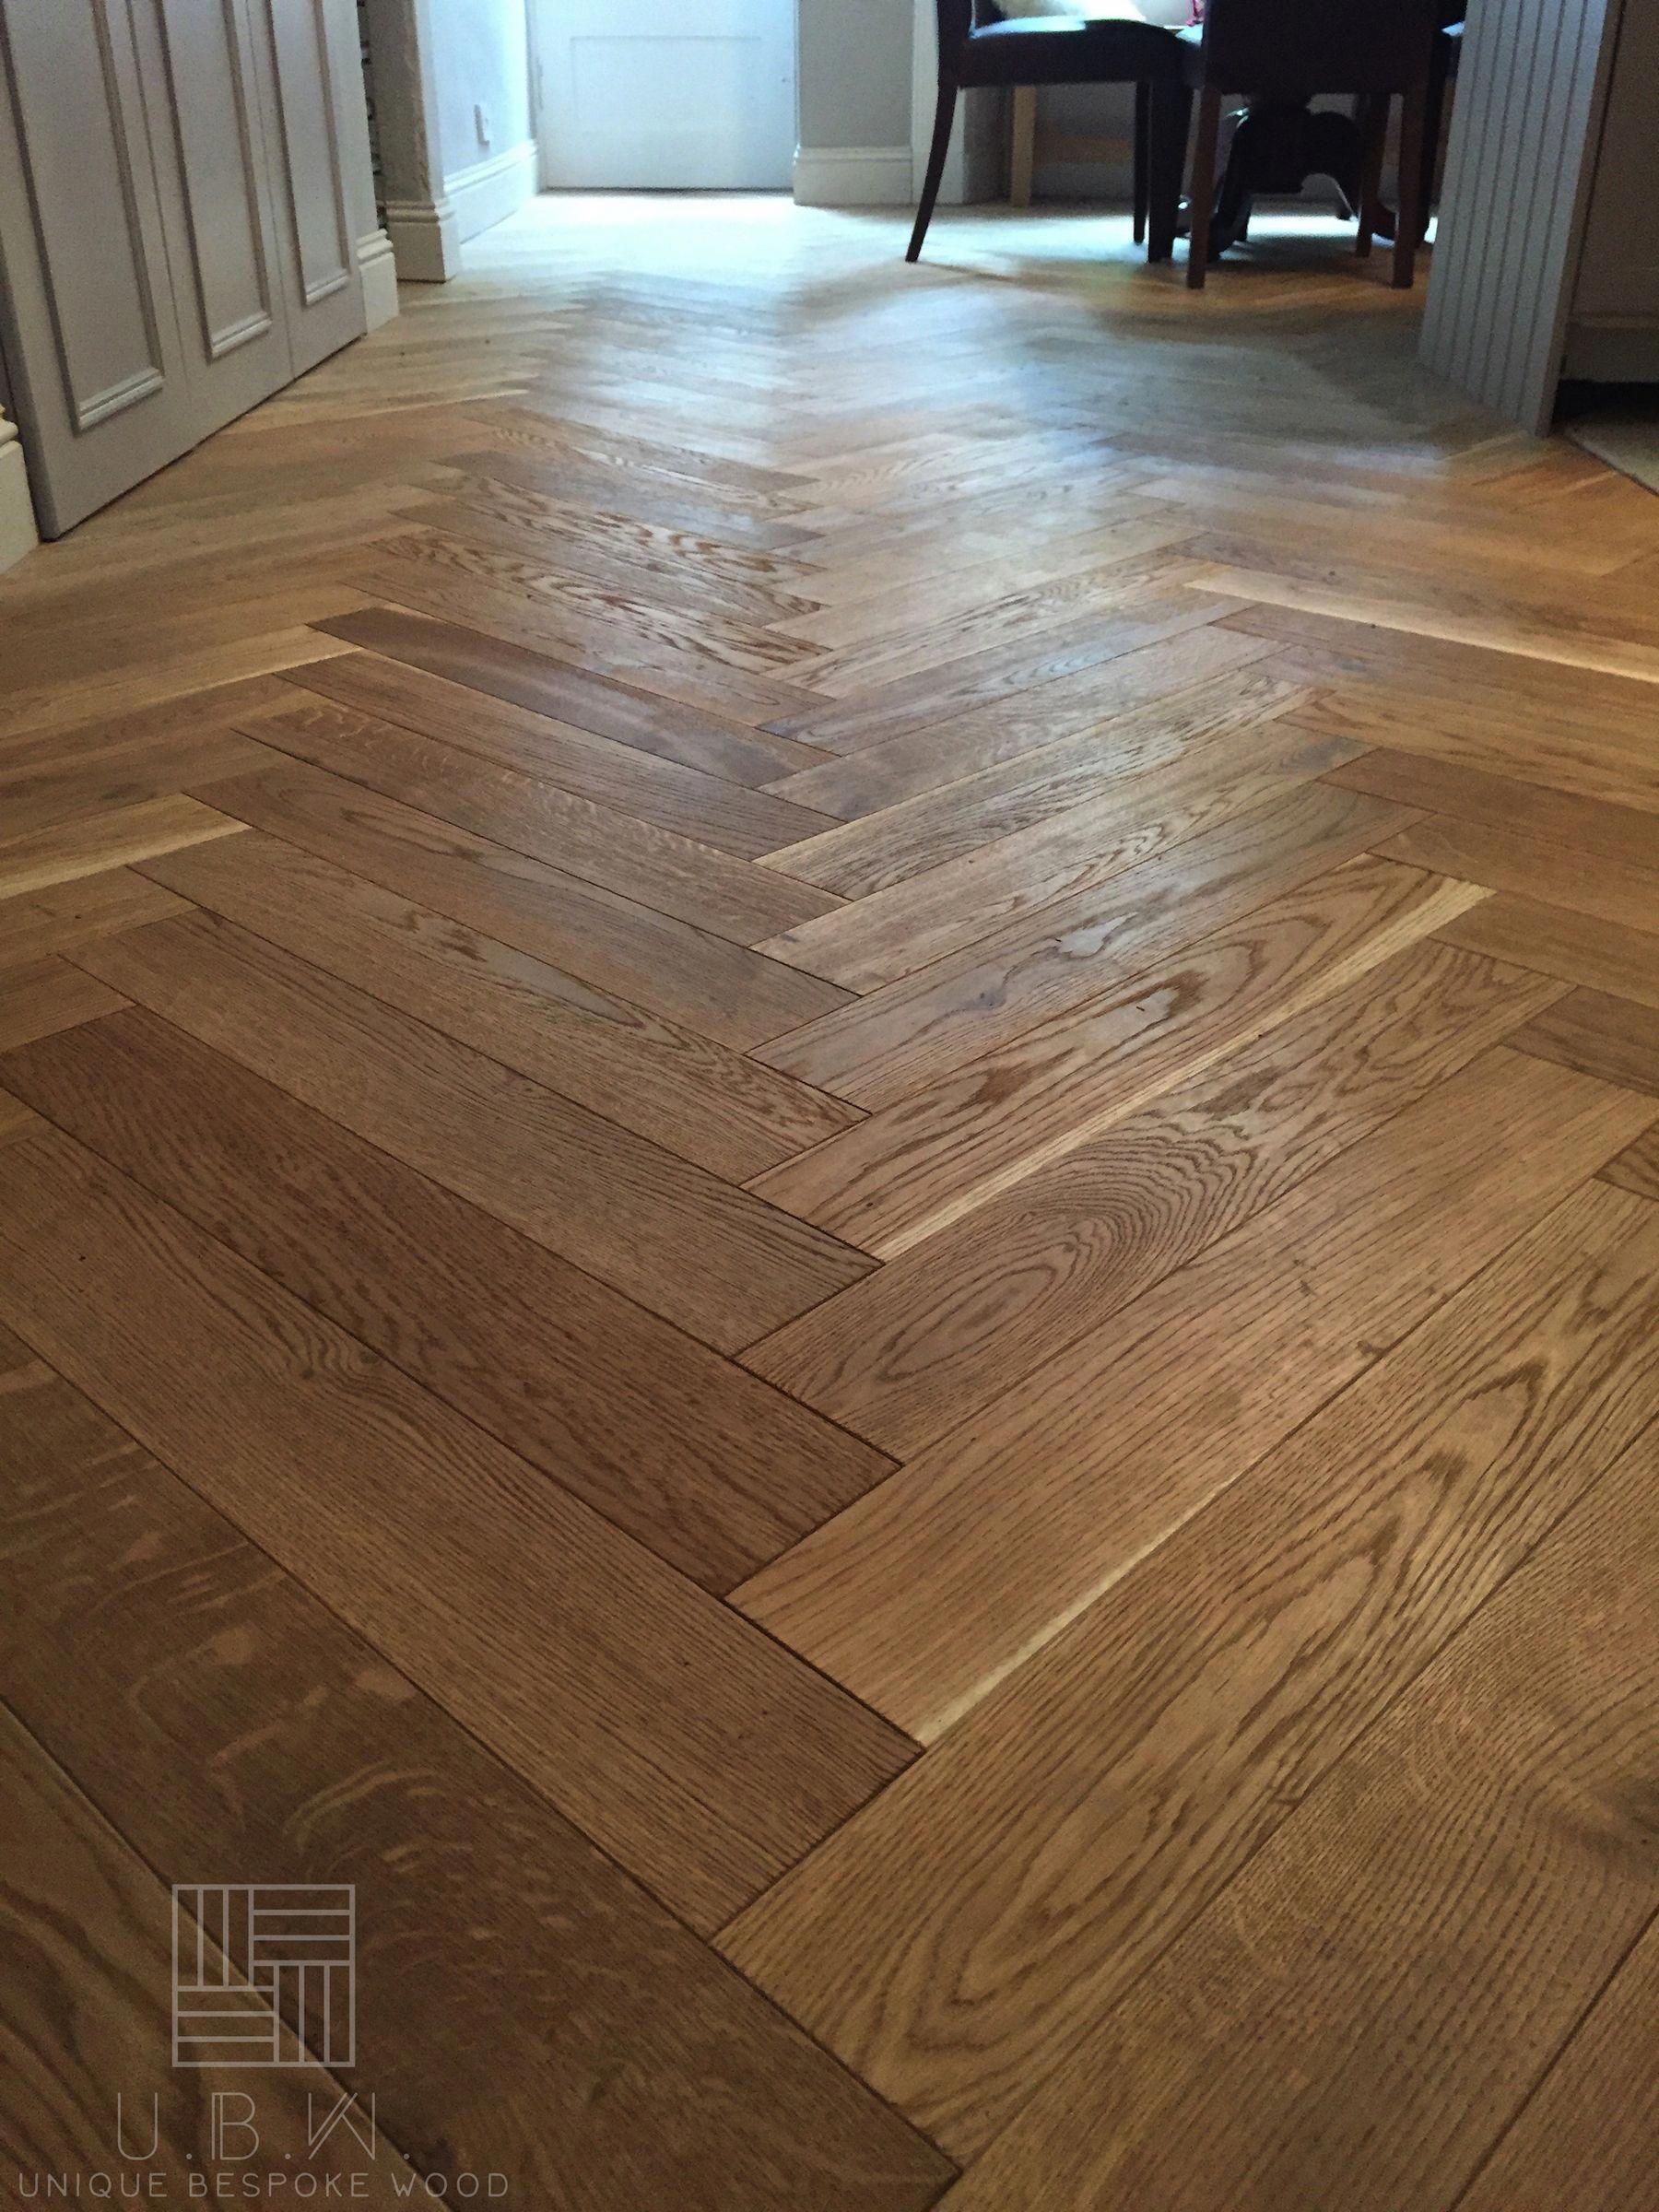 I really love this enchanting engineered wood flooring